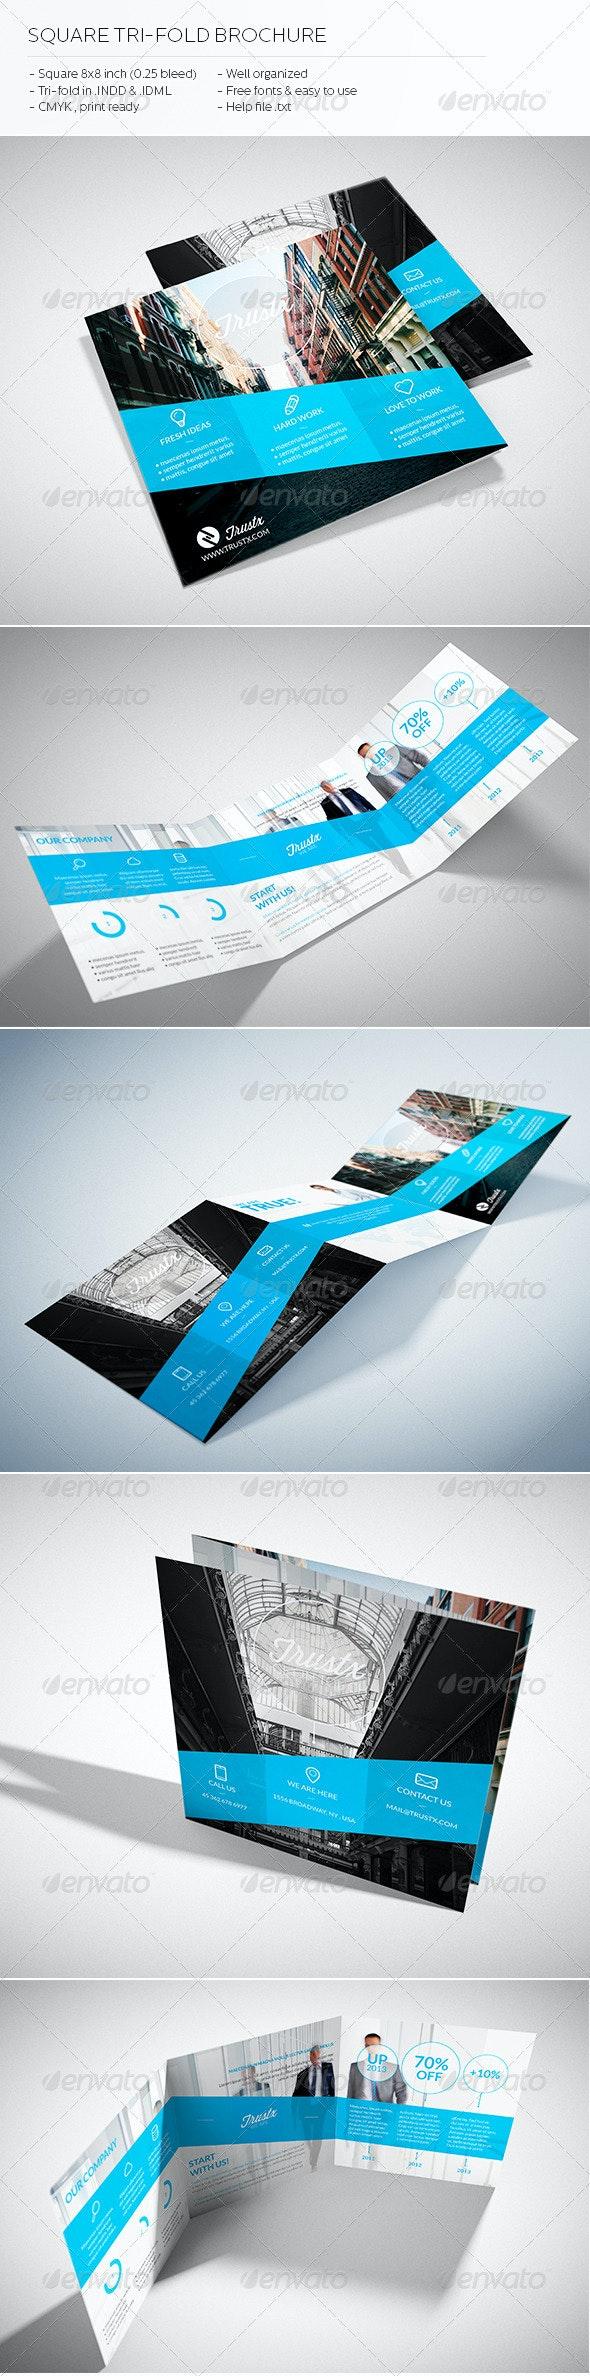 Trustx - Square Tri-fold Brochure - Brochures Print Templates